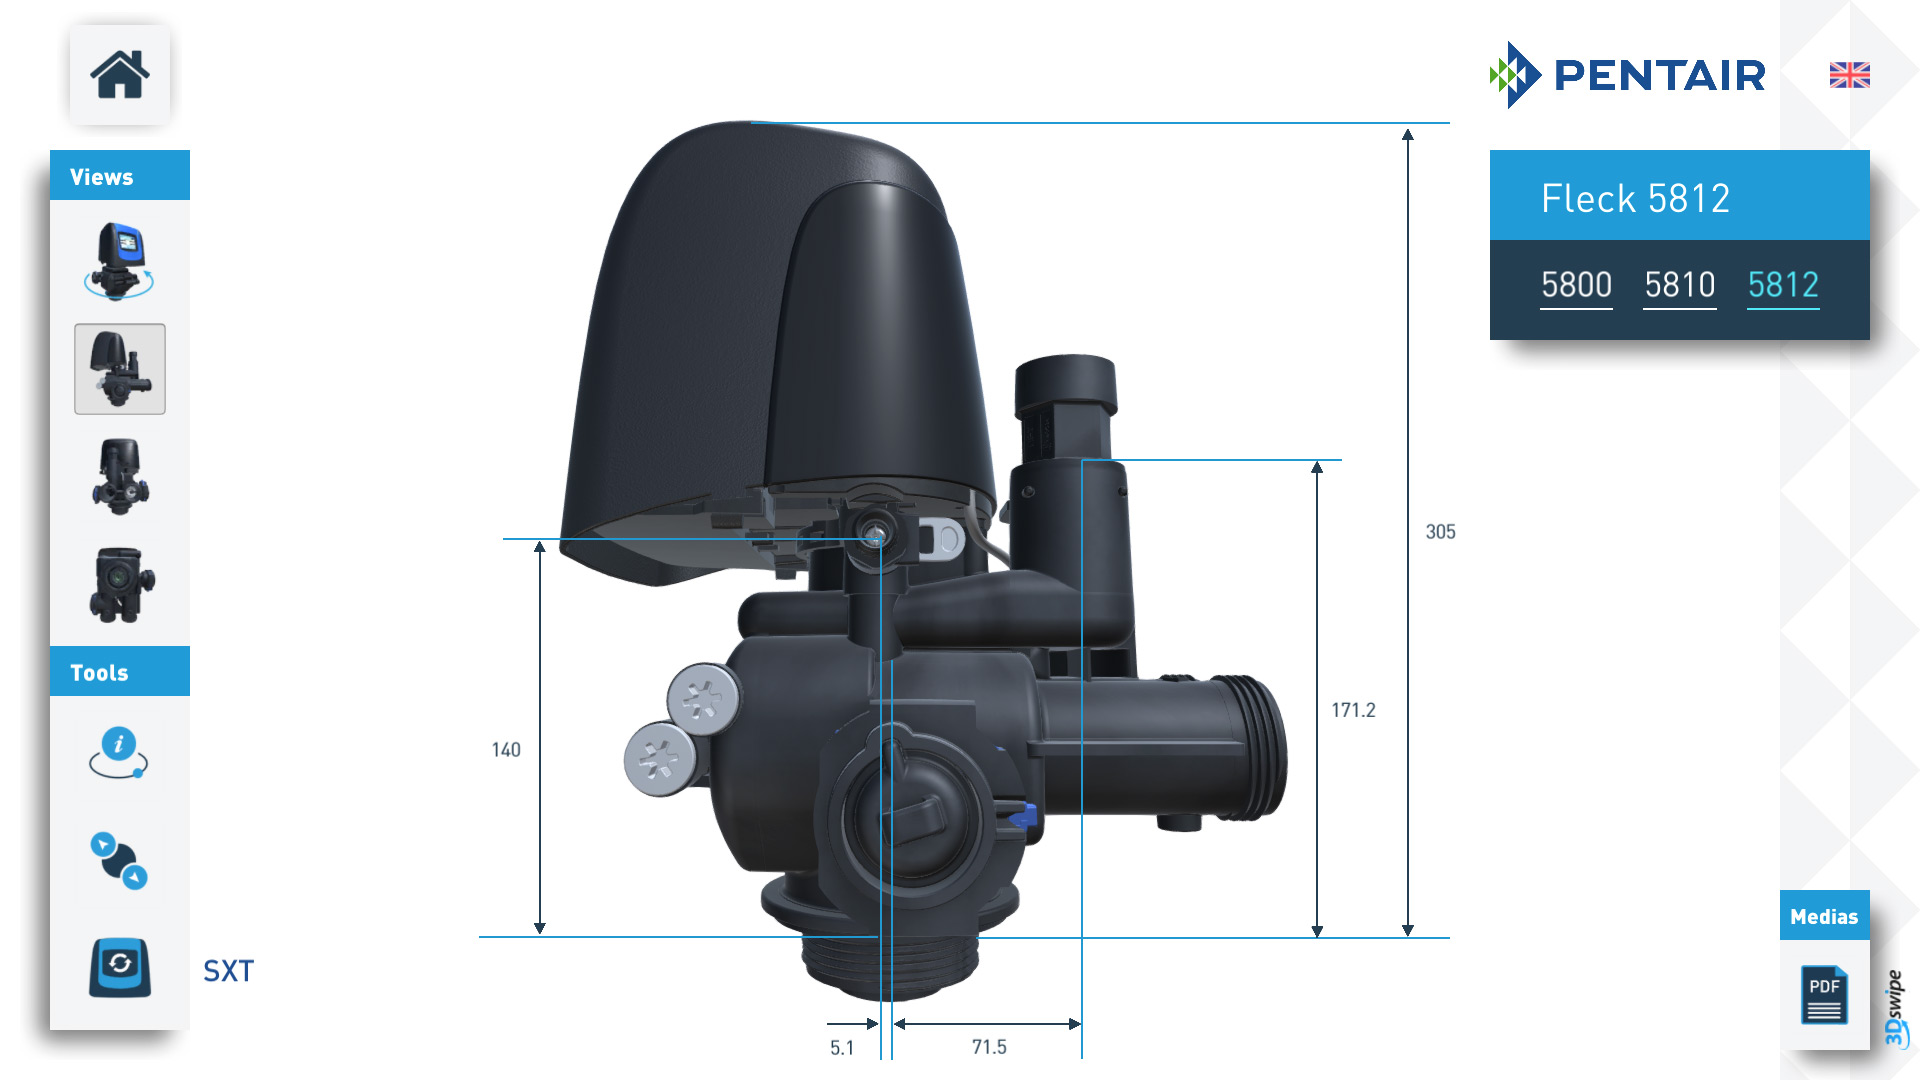 Rendu 3D 3Dswipe pour Pentair